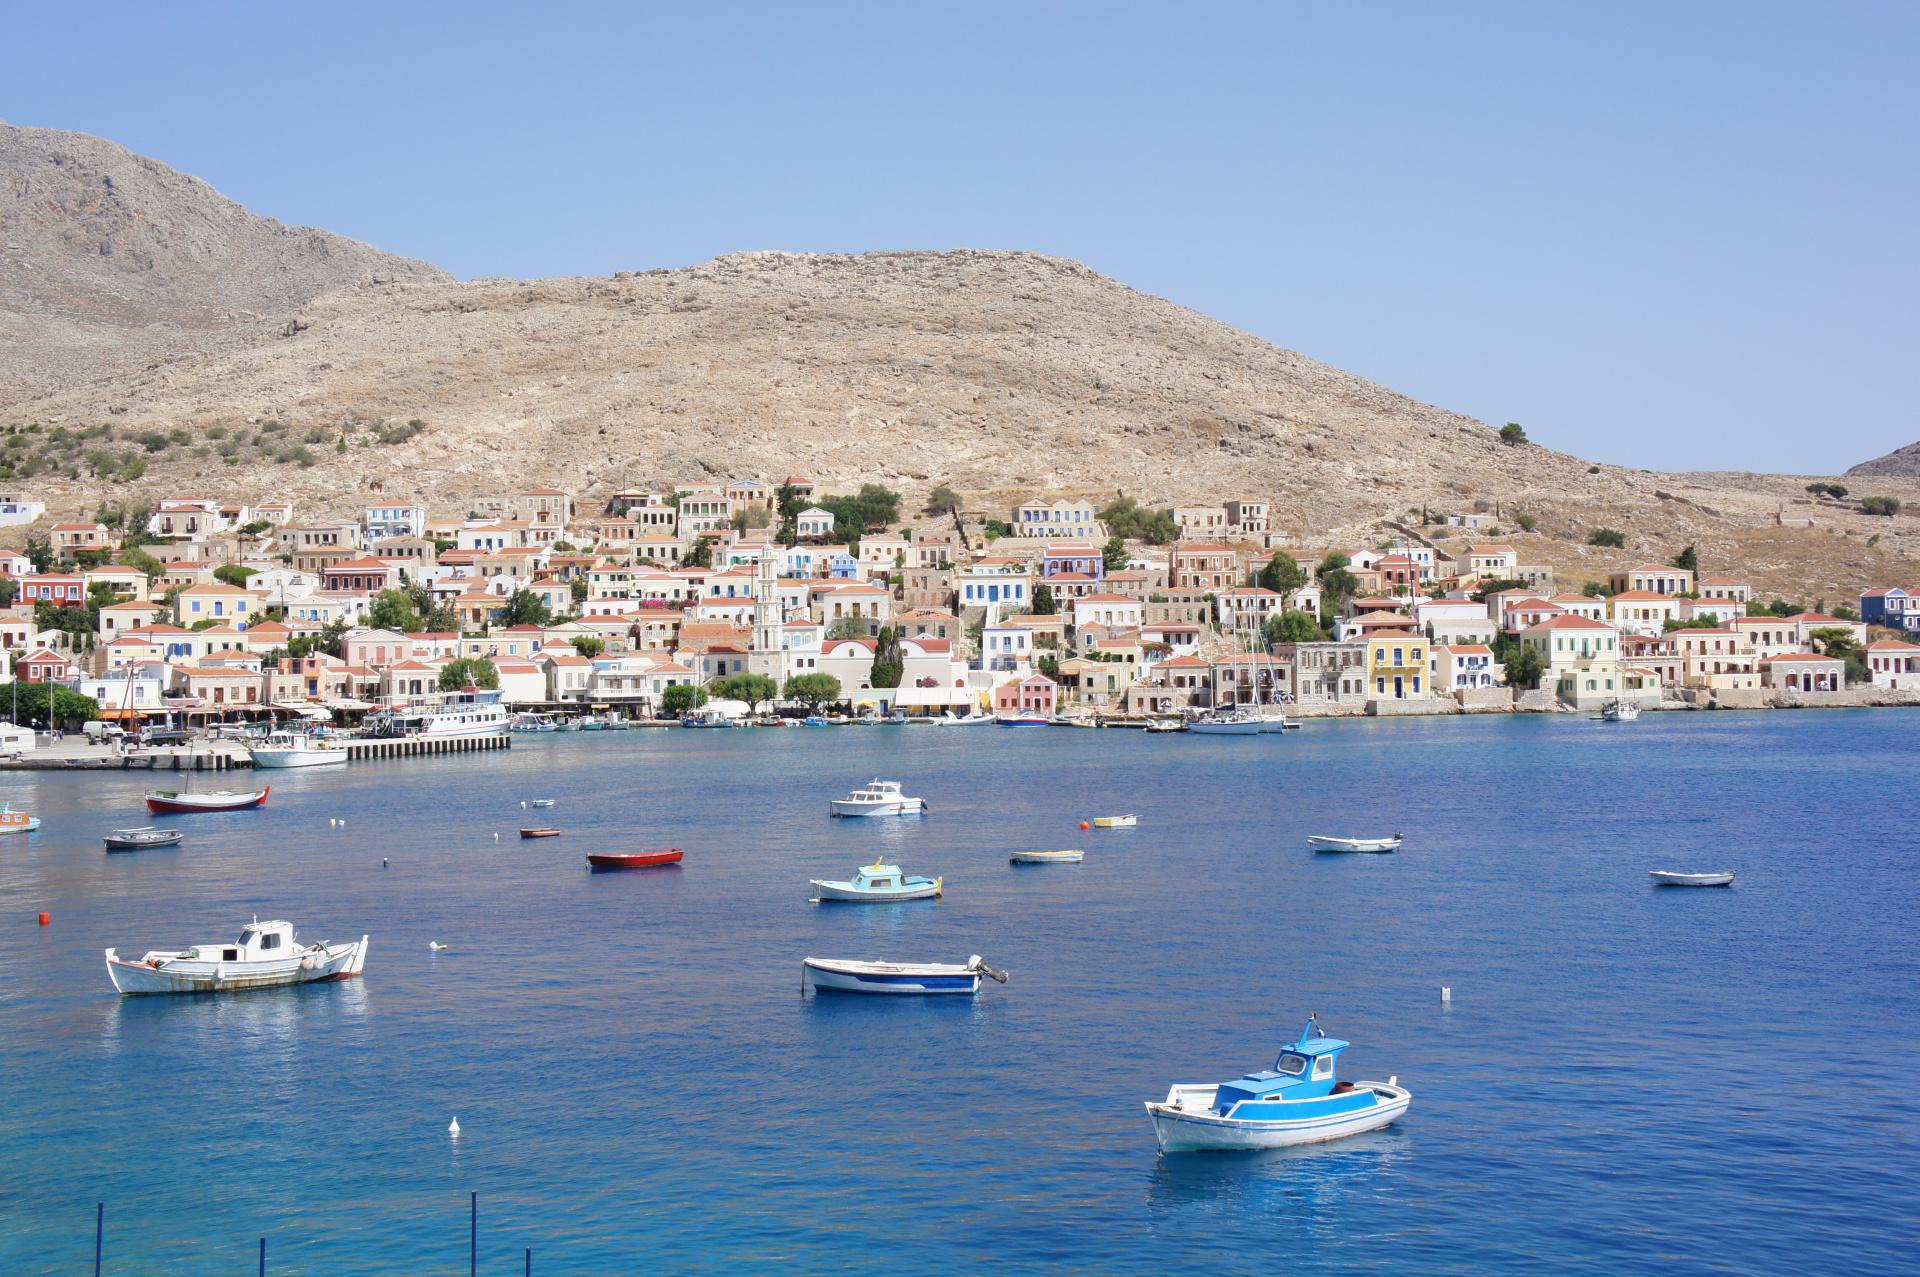 Halki Island